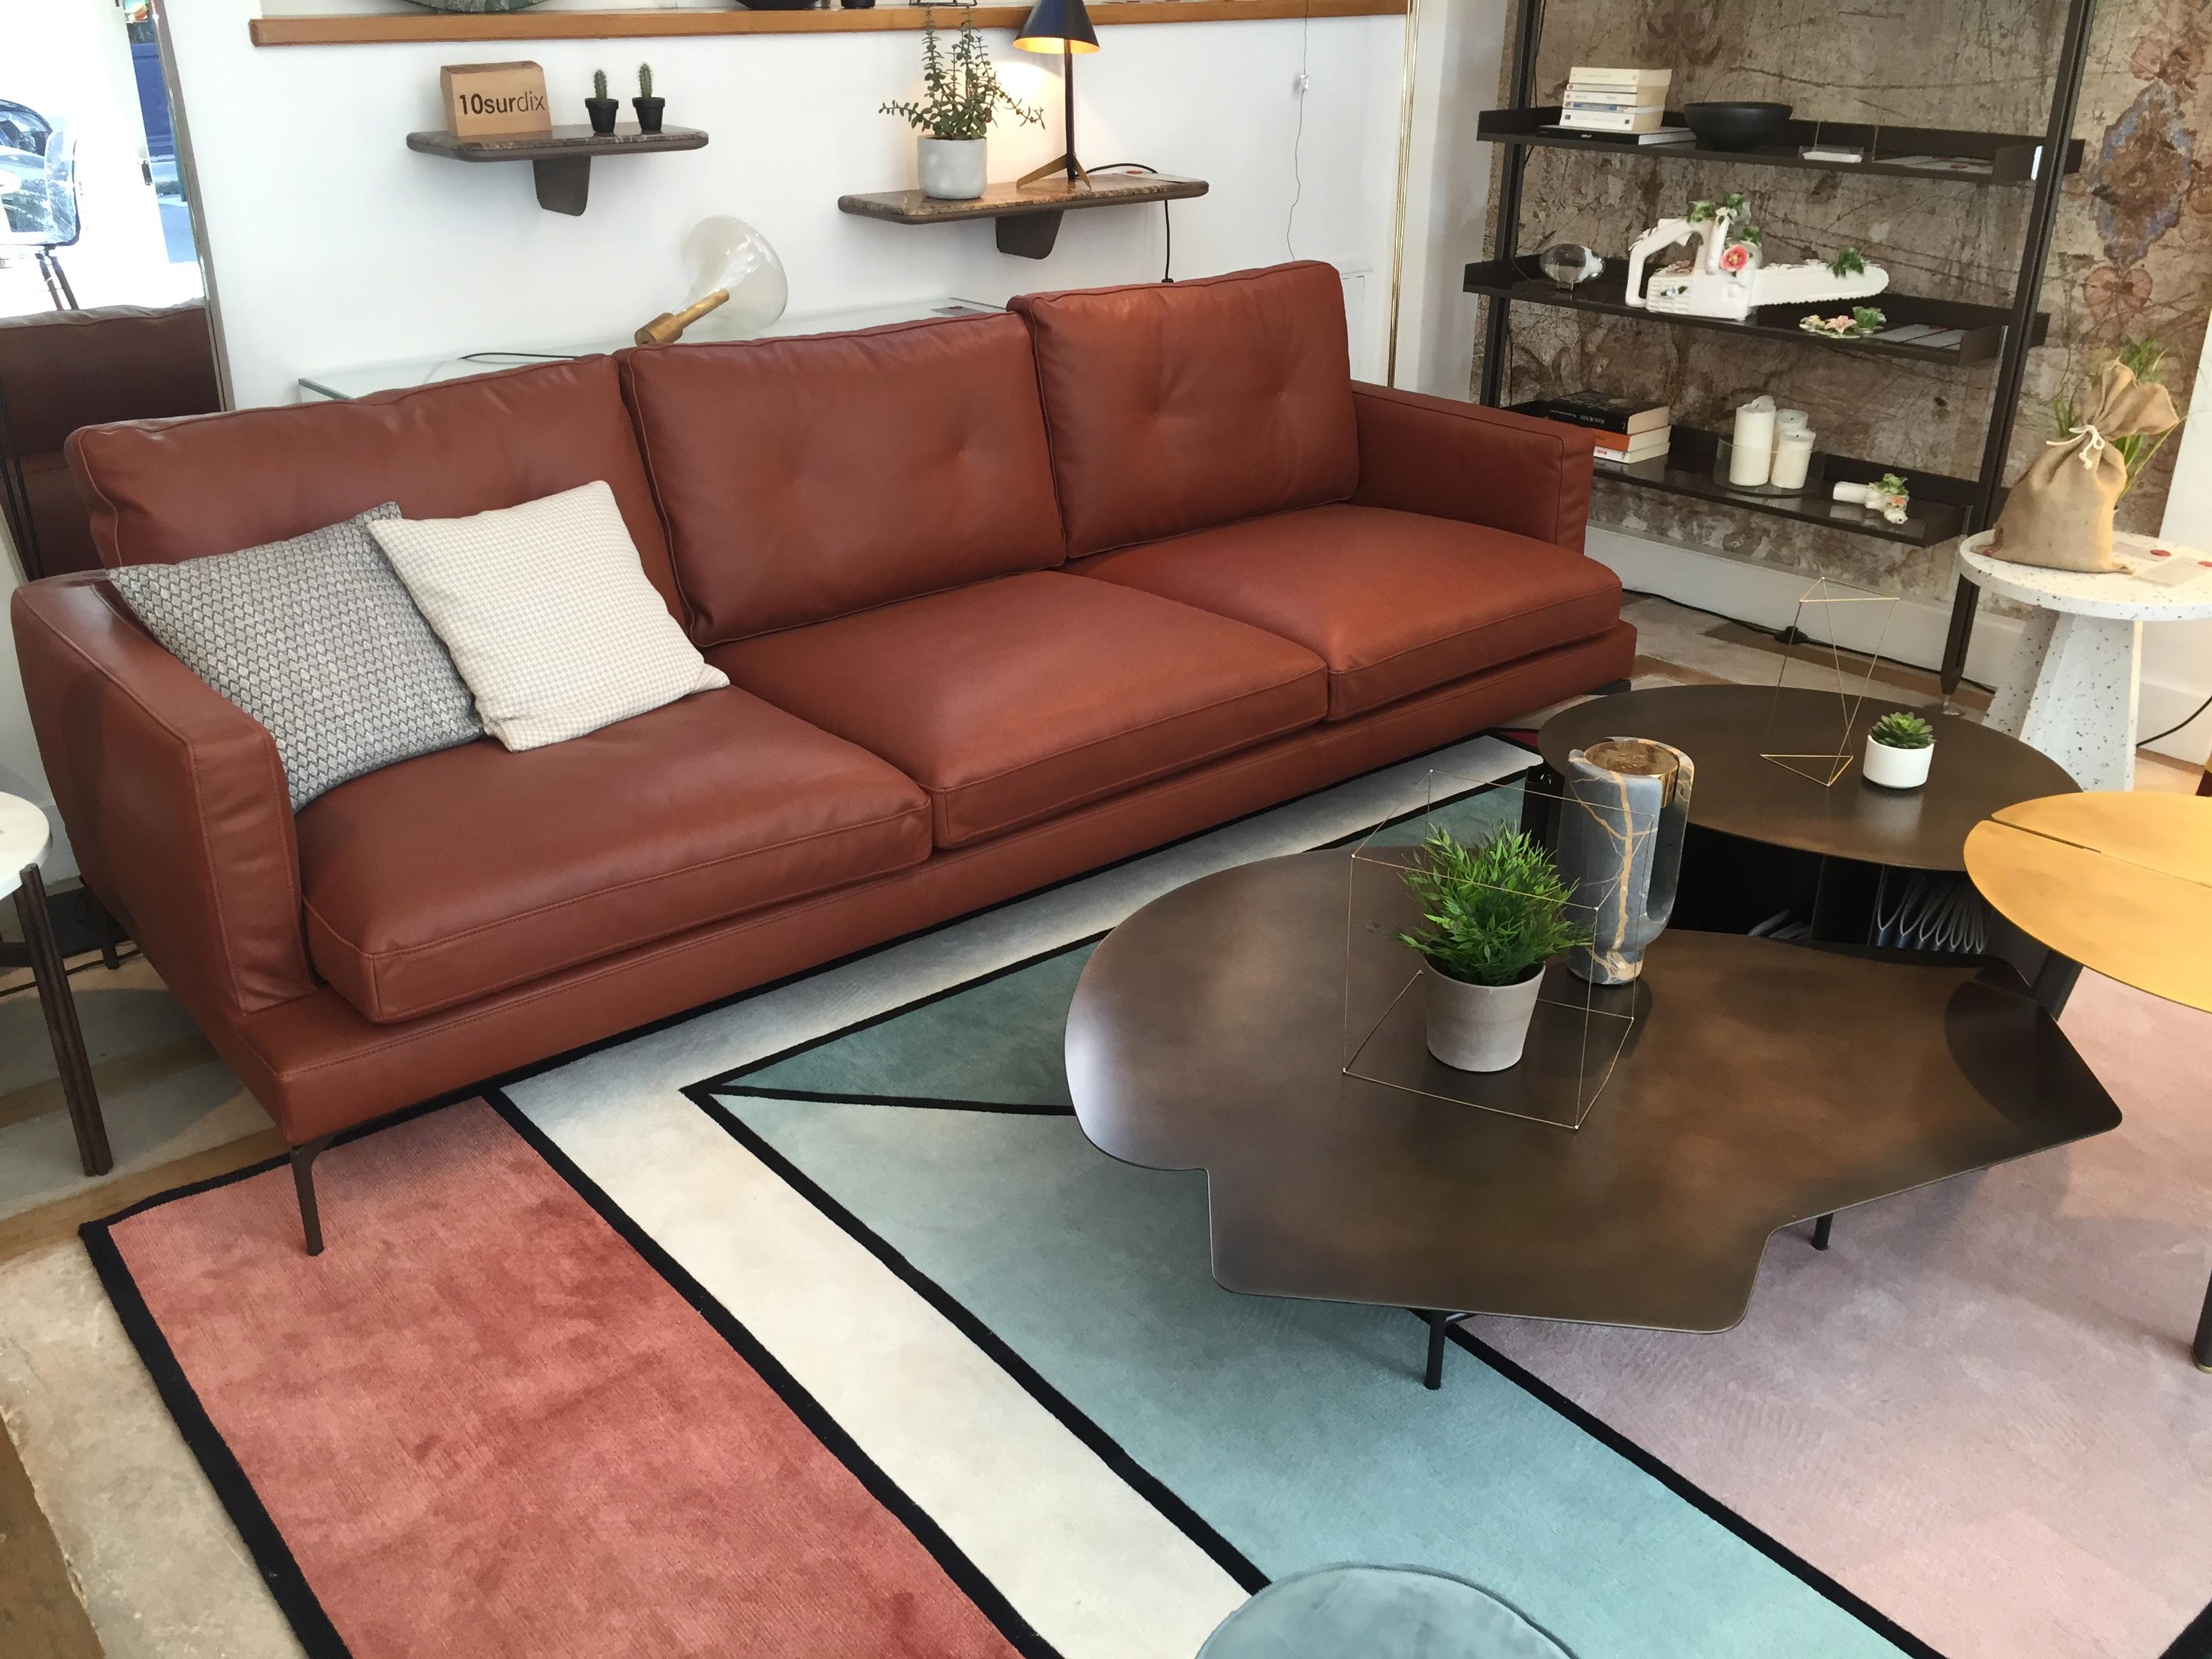 table basse map meubles steinmetz. Black Bedroom Furniture Sets. Home Design Ideas